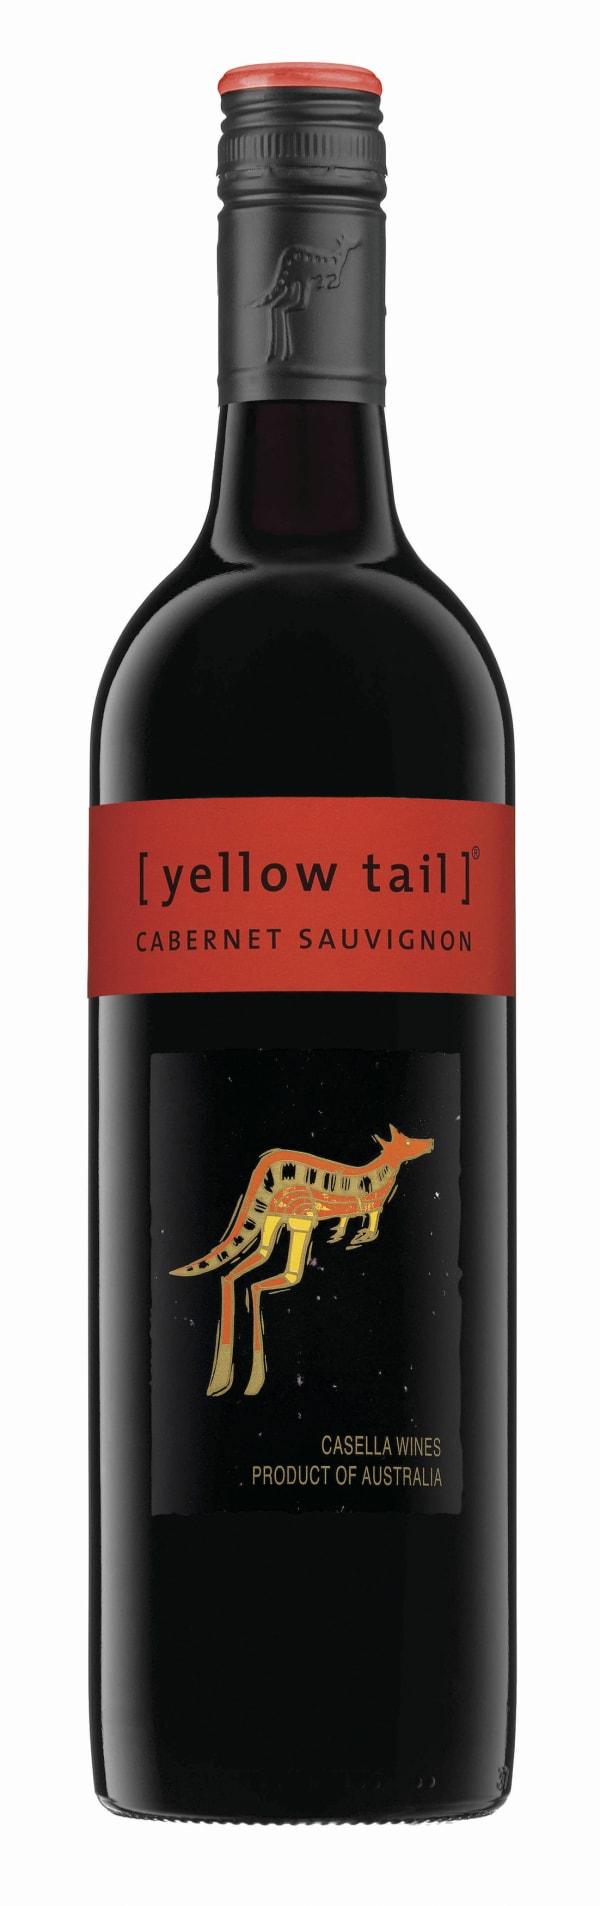 Yellow Tail Cabernet Sauvignon 2016